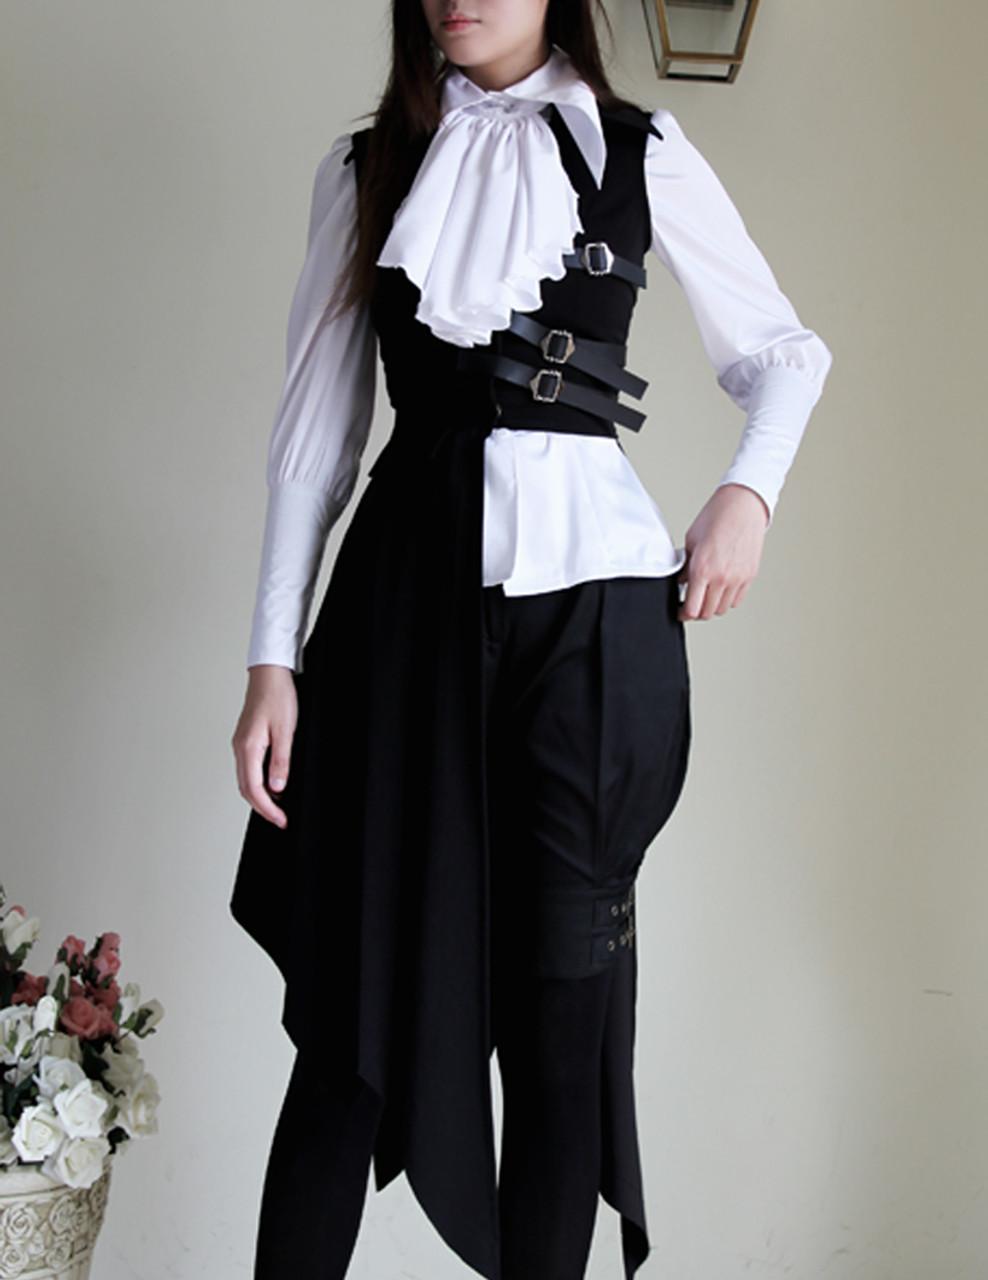 Pirate Gothic Pleated Bias Bottom Long Unisex Vest rNpUKLl